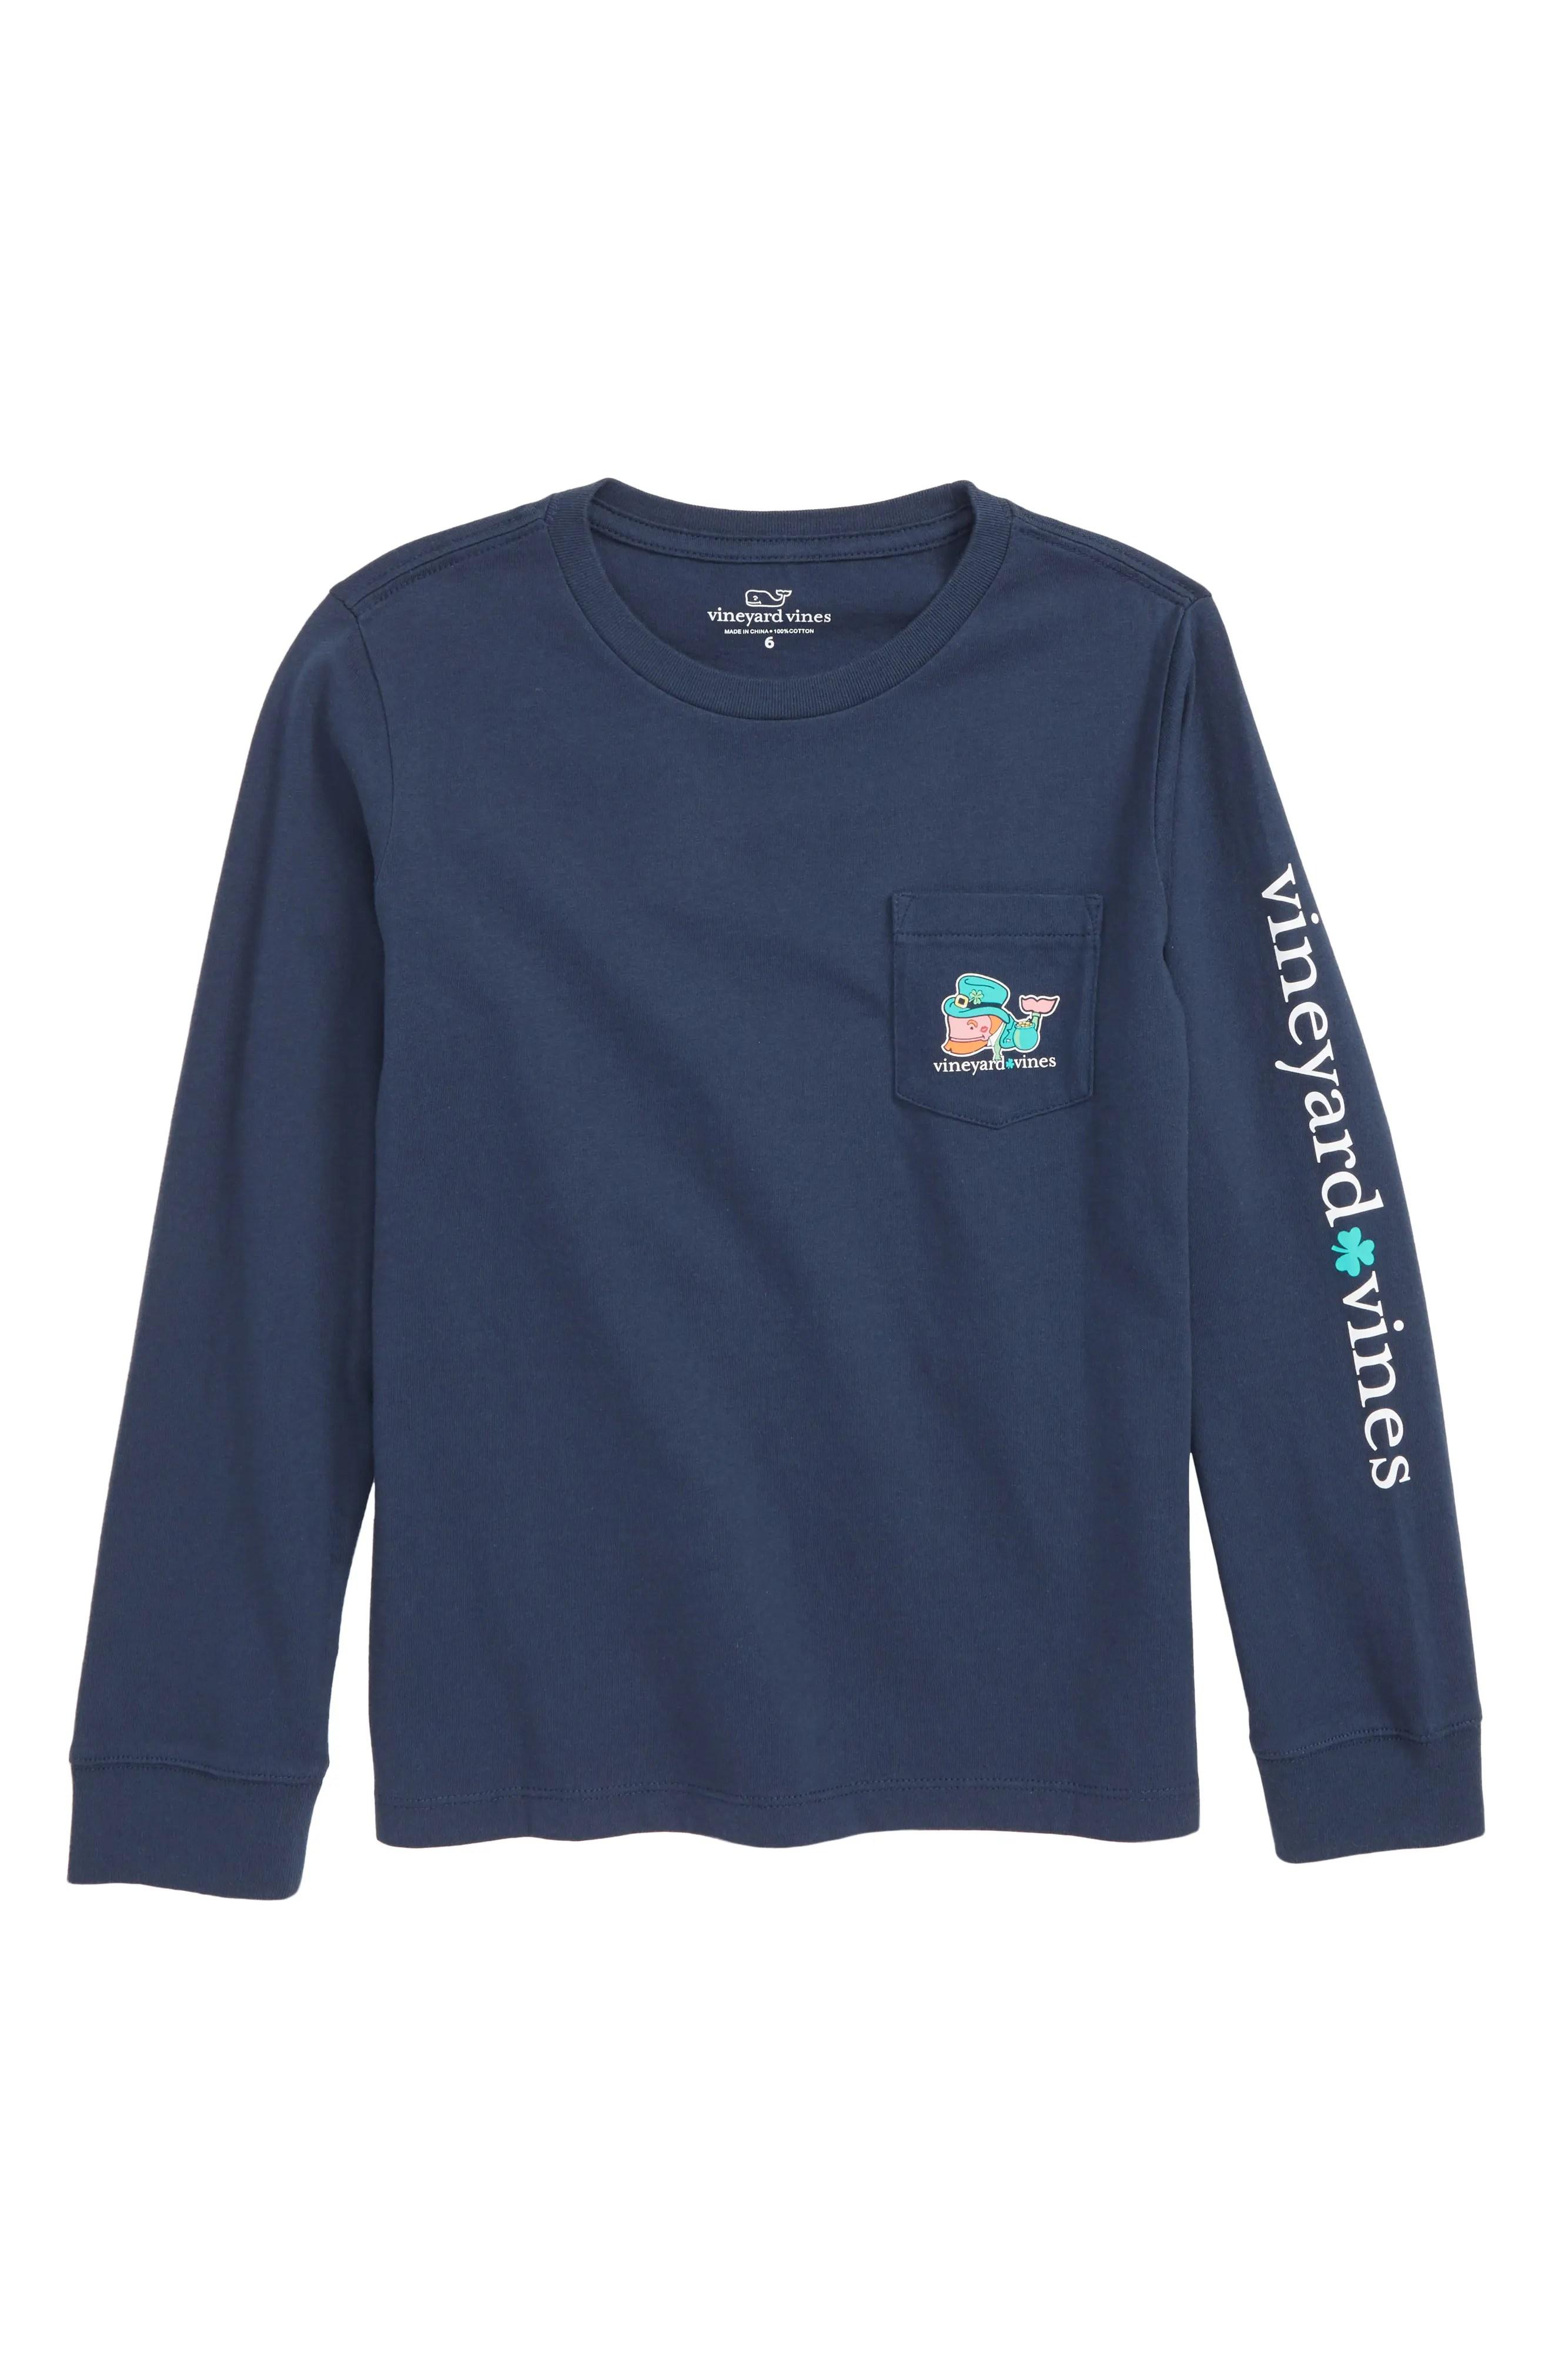 Vineyard vines kiss me    irish pocket  shirt big boys also kids apparel shirts jeans pants hoodies rh shoprdstrom